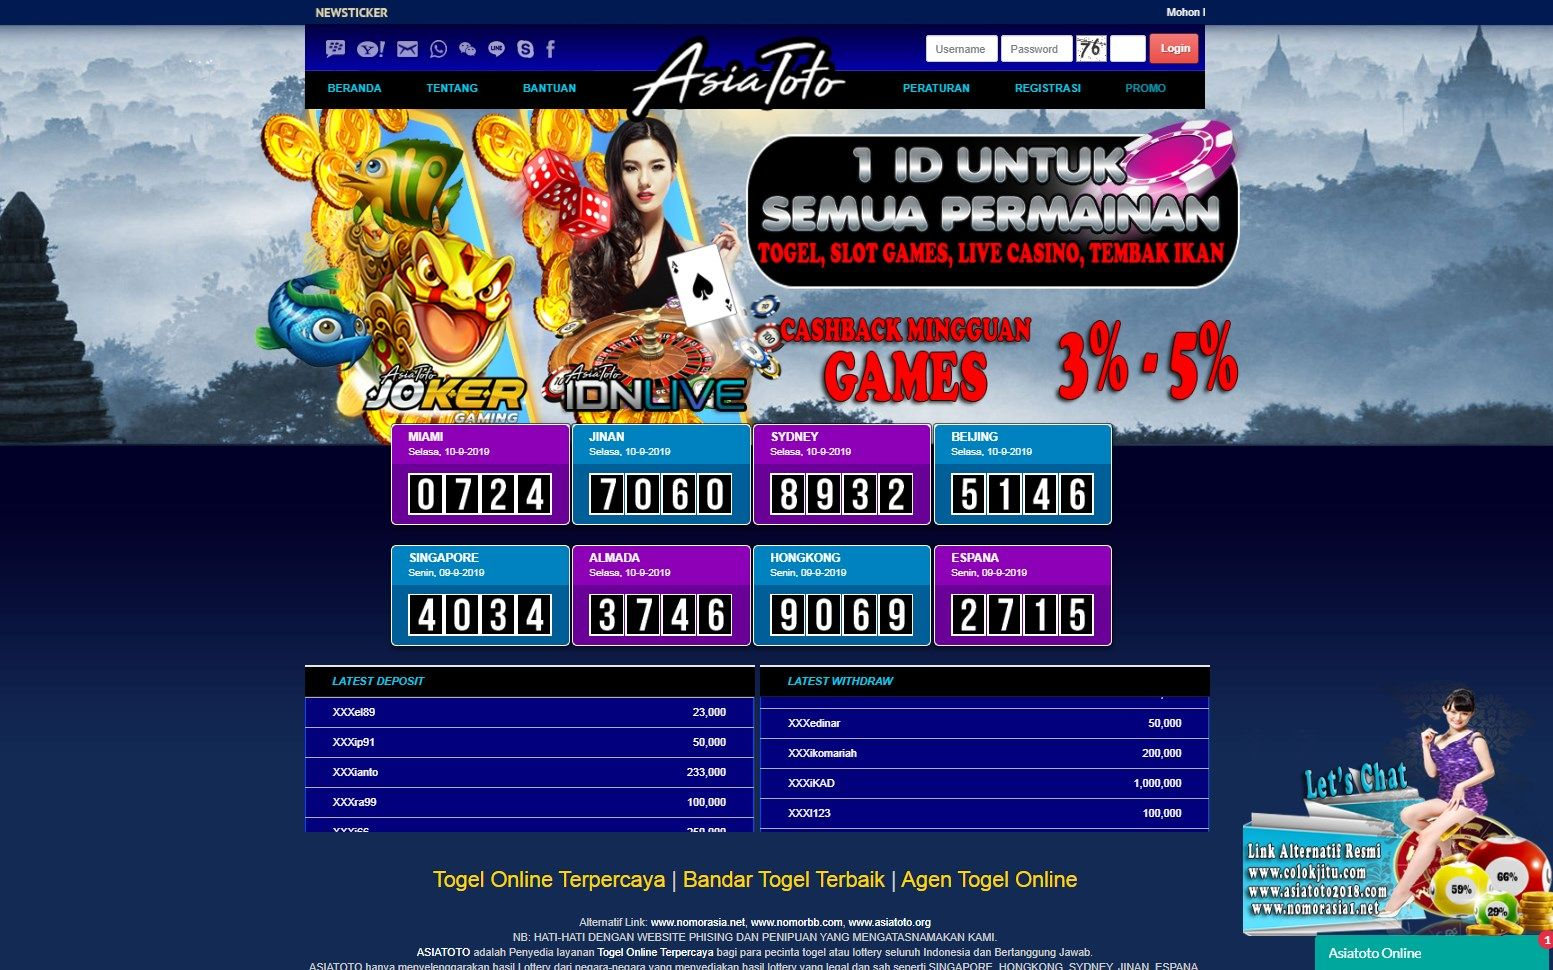 Asiatoto Menyediakan Promo Cashback Untuk Permainan Idn Live Casino Cashback Yang Di Dapatkan Minimal Kekalahan 500 000 Ribu Dan Pem Indonesia Website